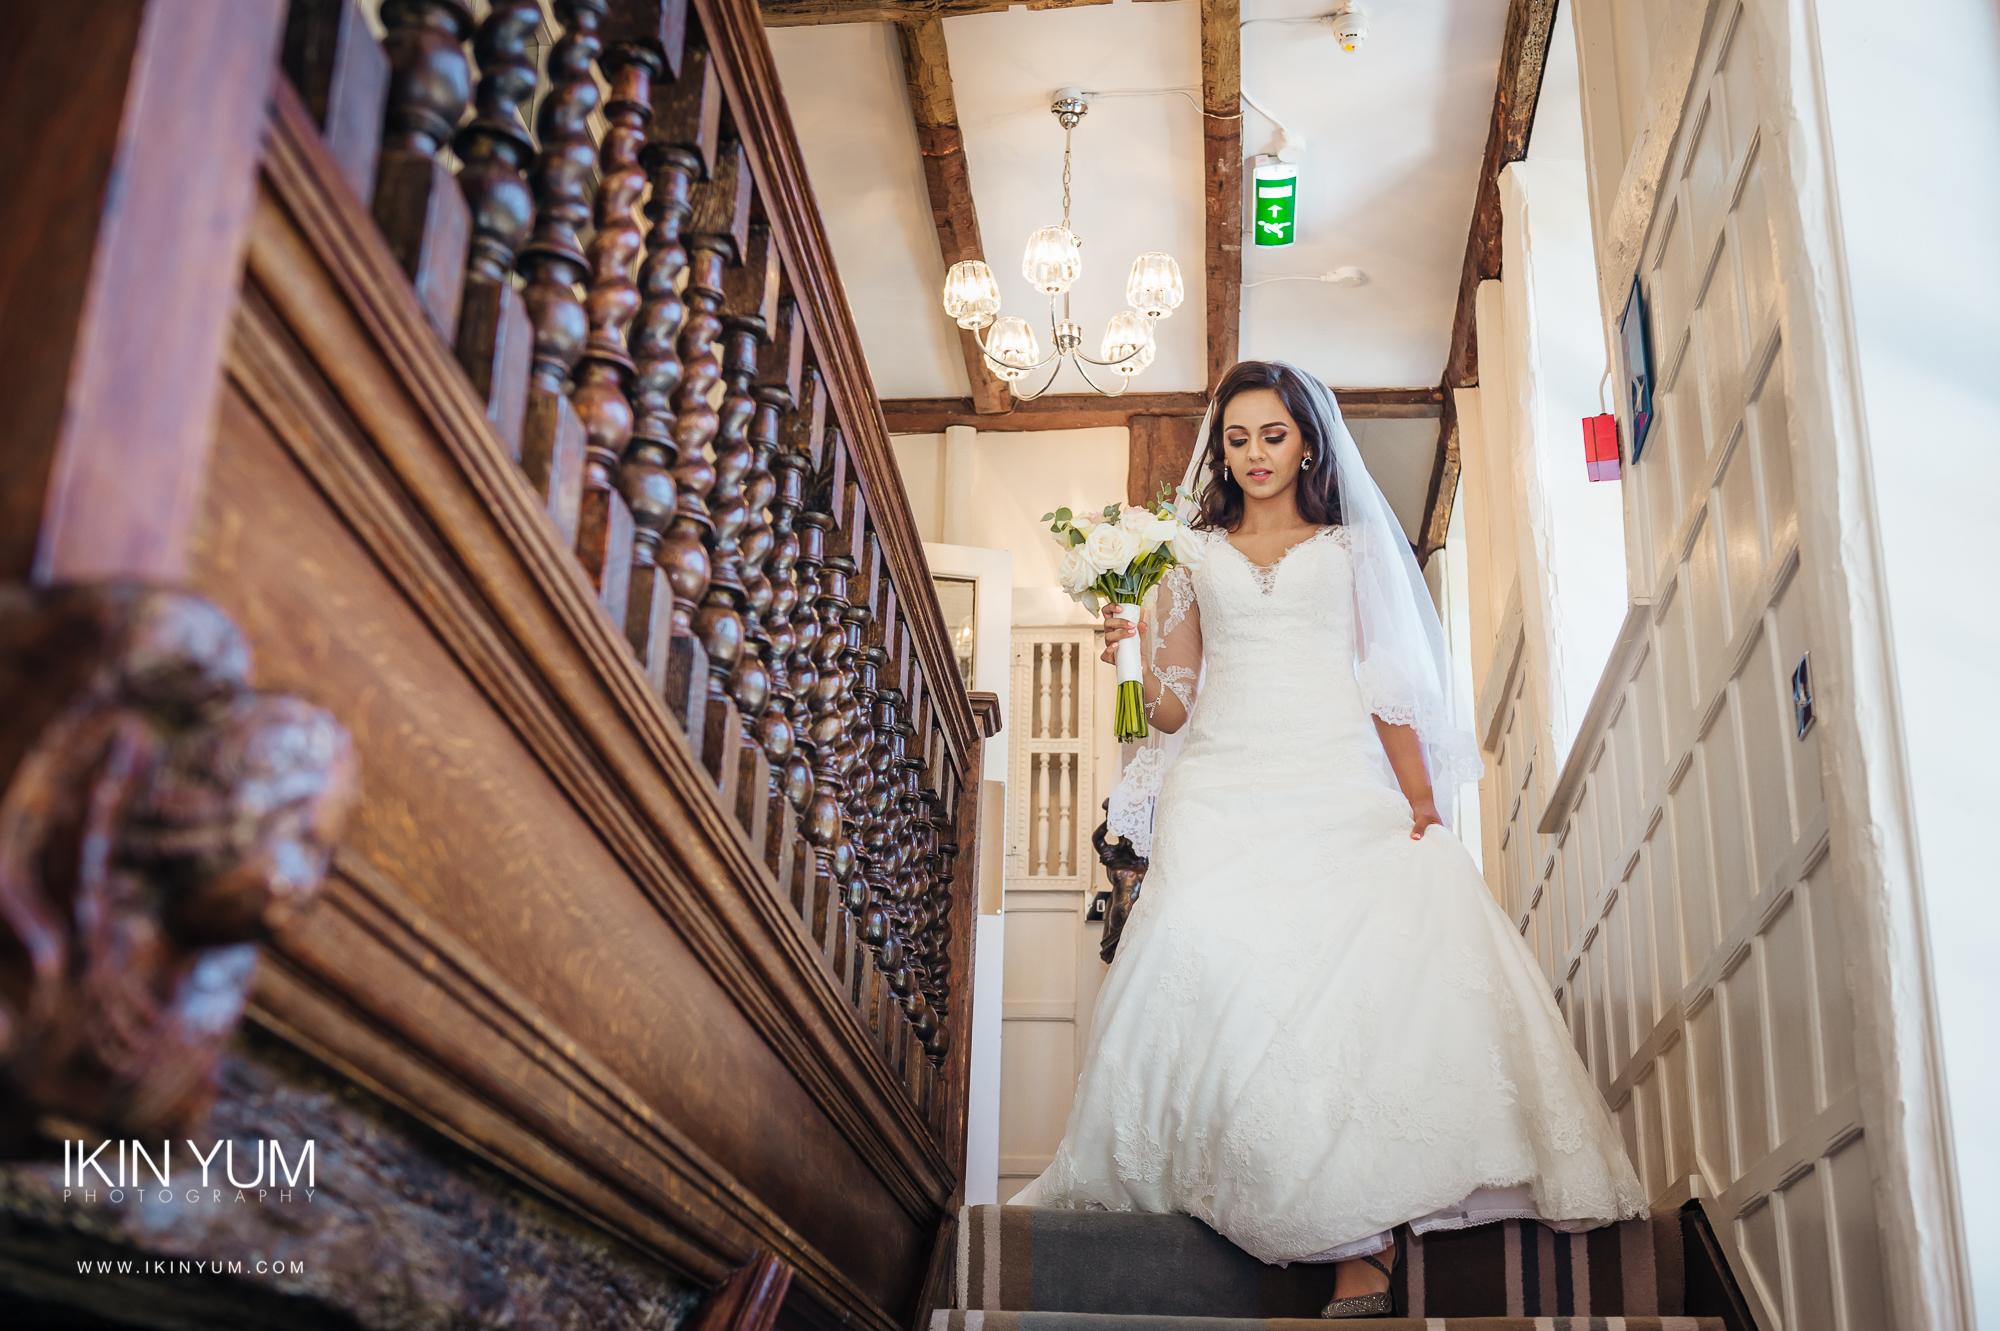 Laura Ashley Manor Wedding - Ikin Yum Photography-039.jpg